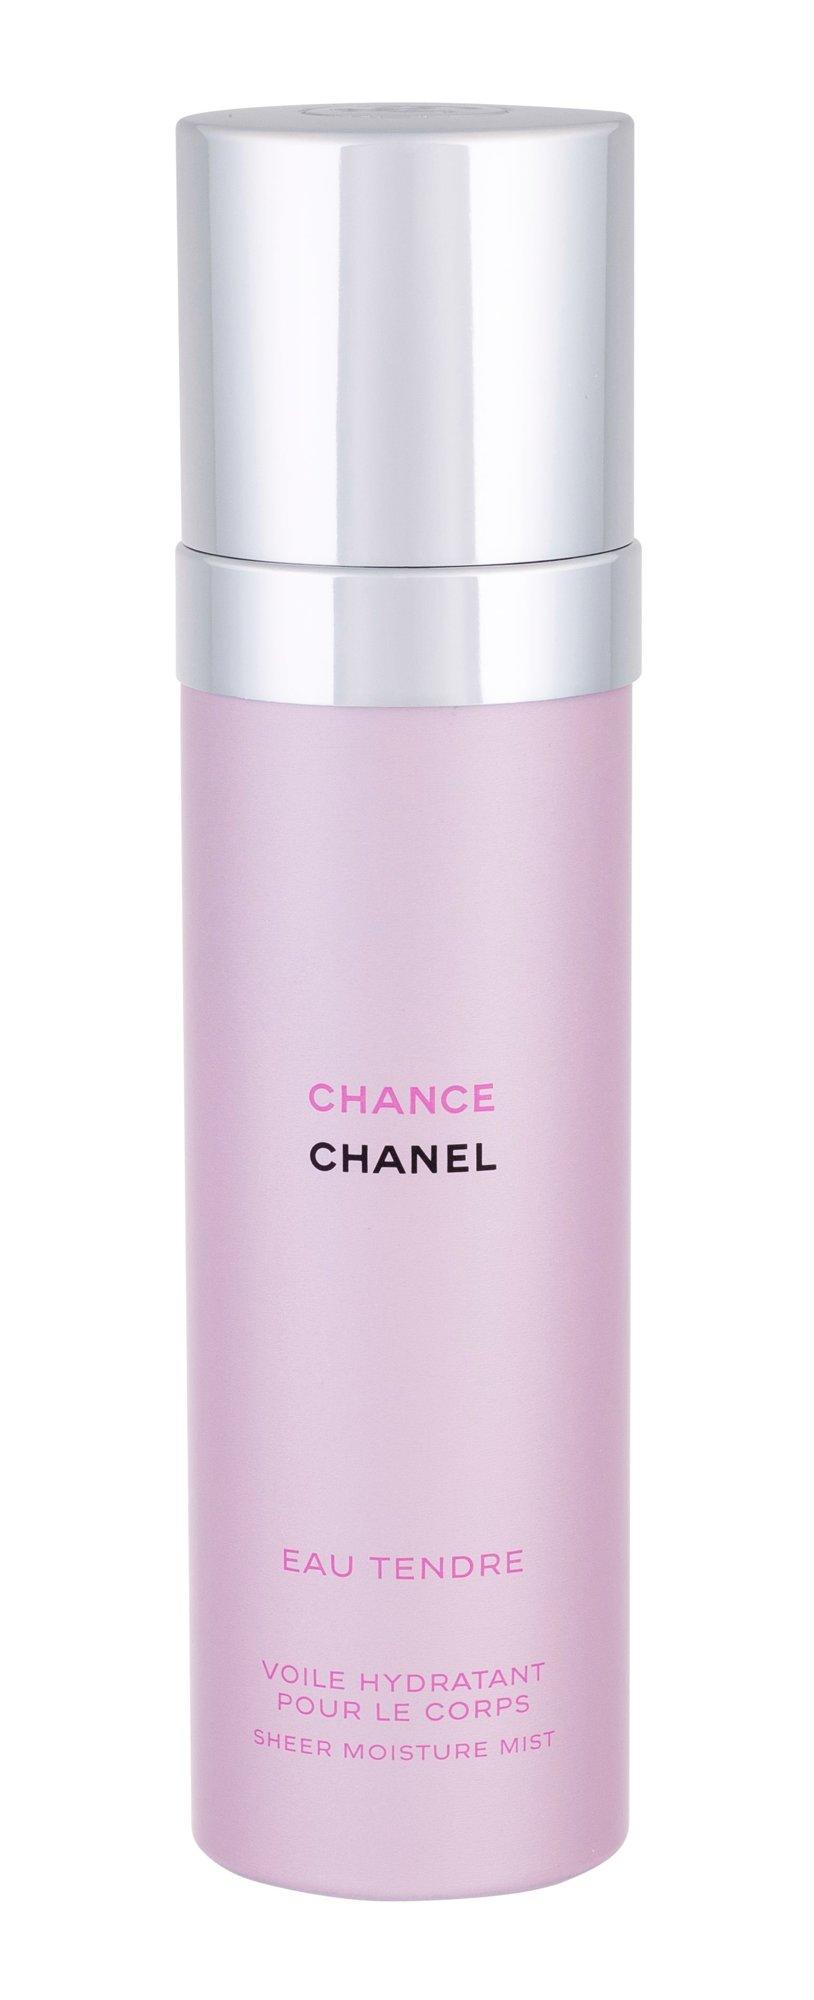 Chanel Chance Body veil 100ml